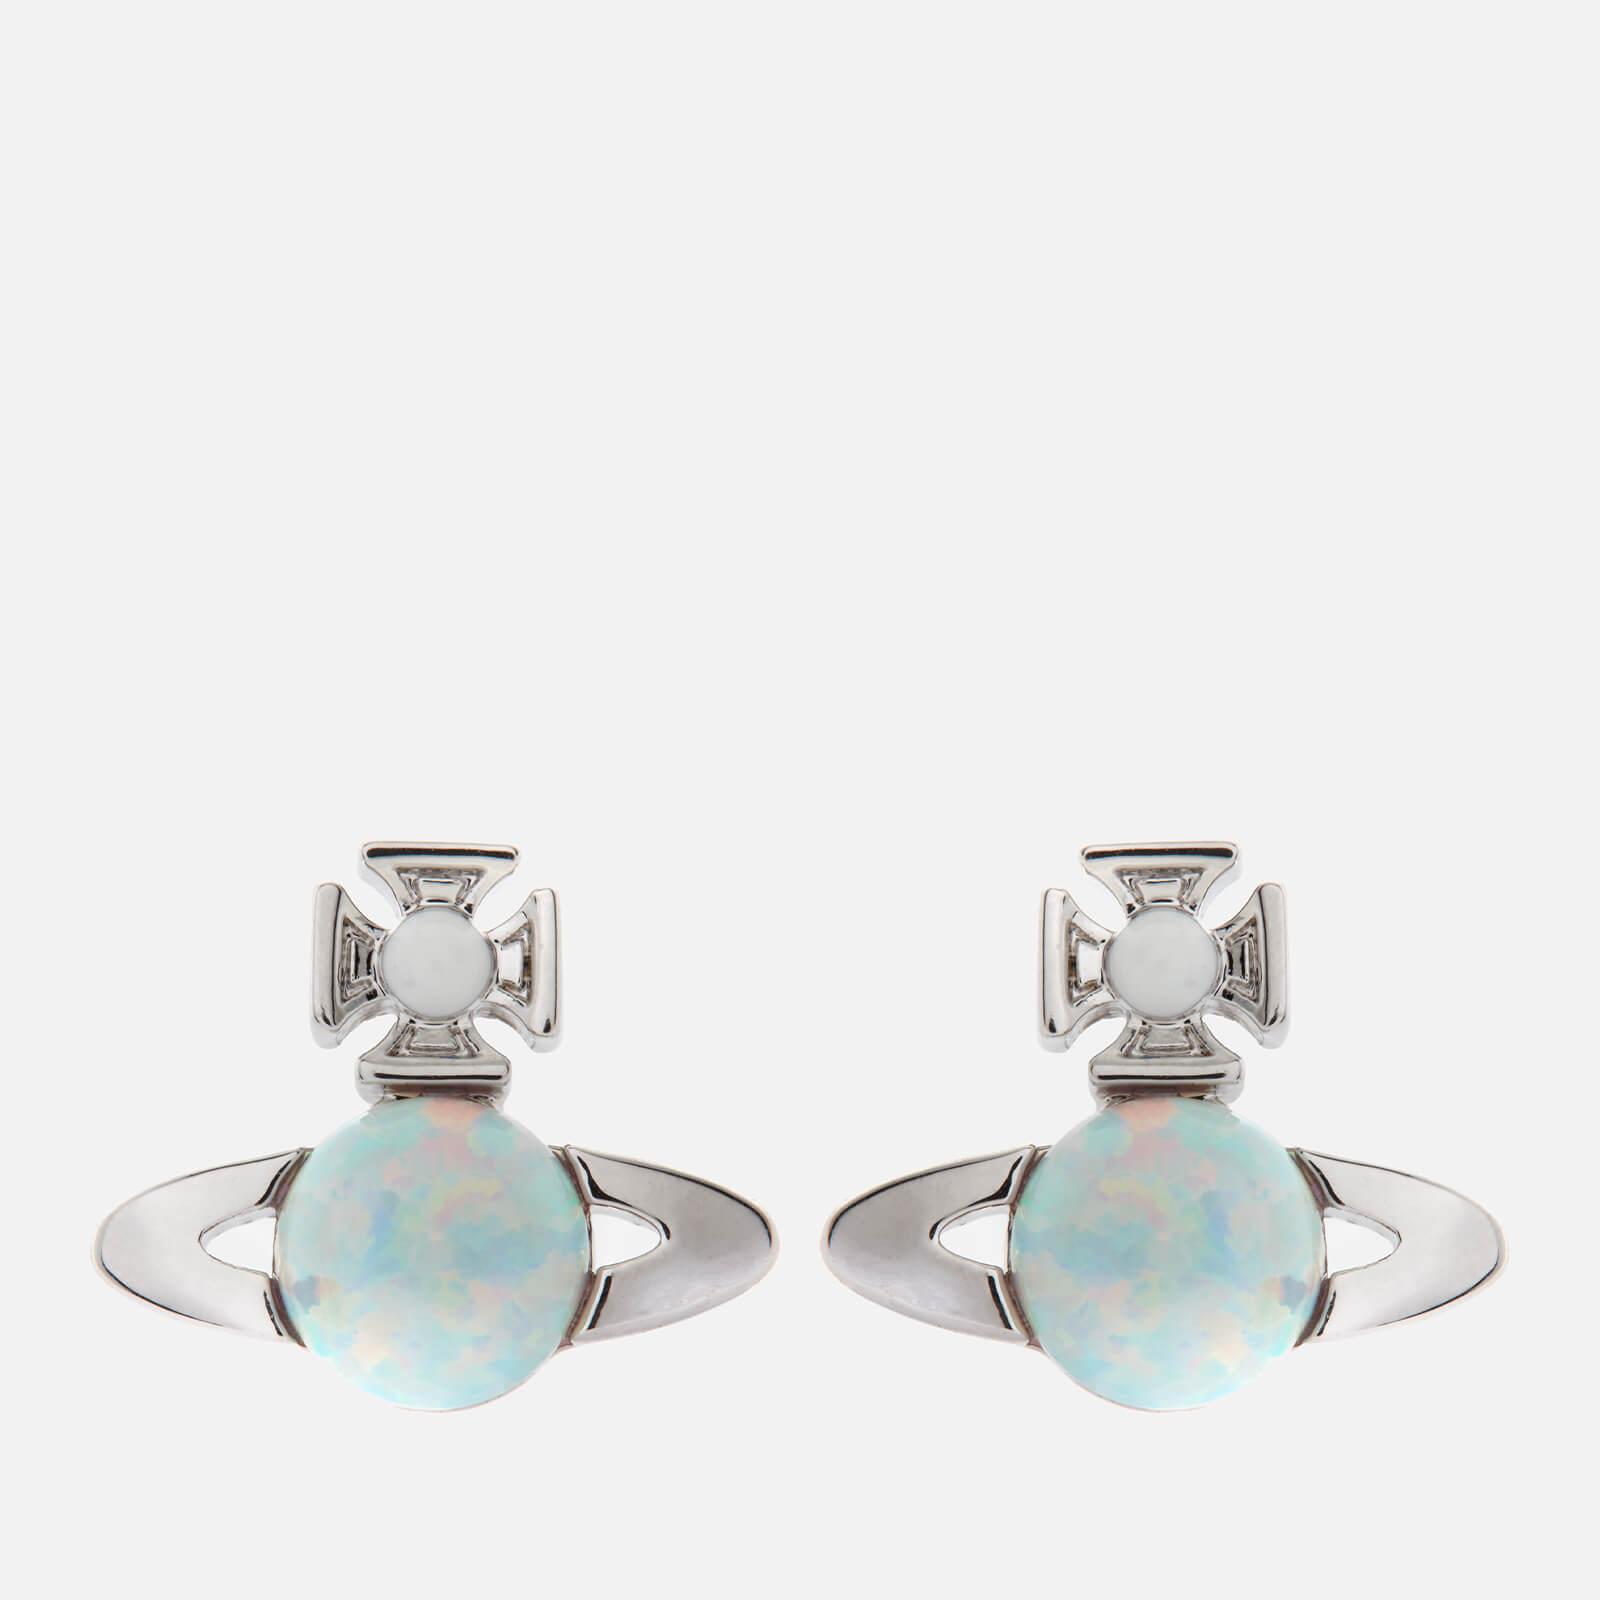 Vivienne Westwood Women's Isabelitta Bas Relief Earrings - Rhodium White